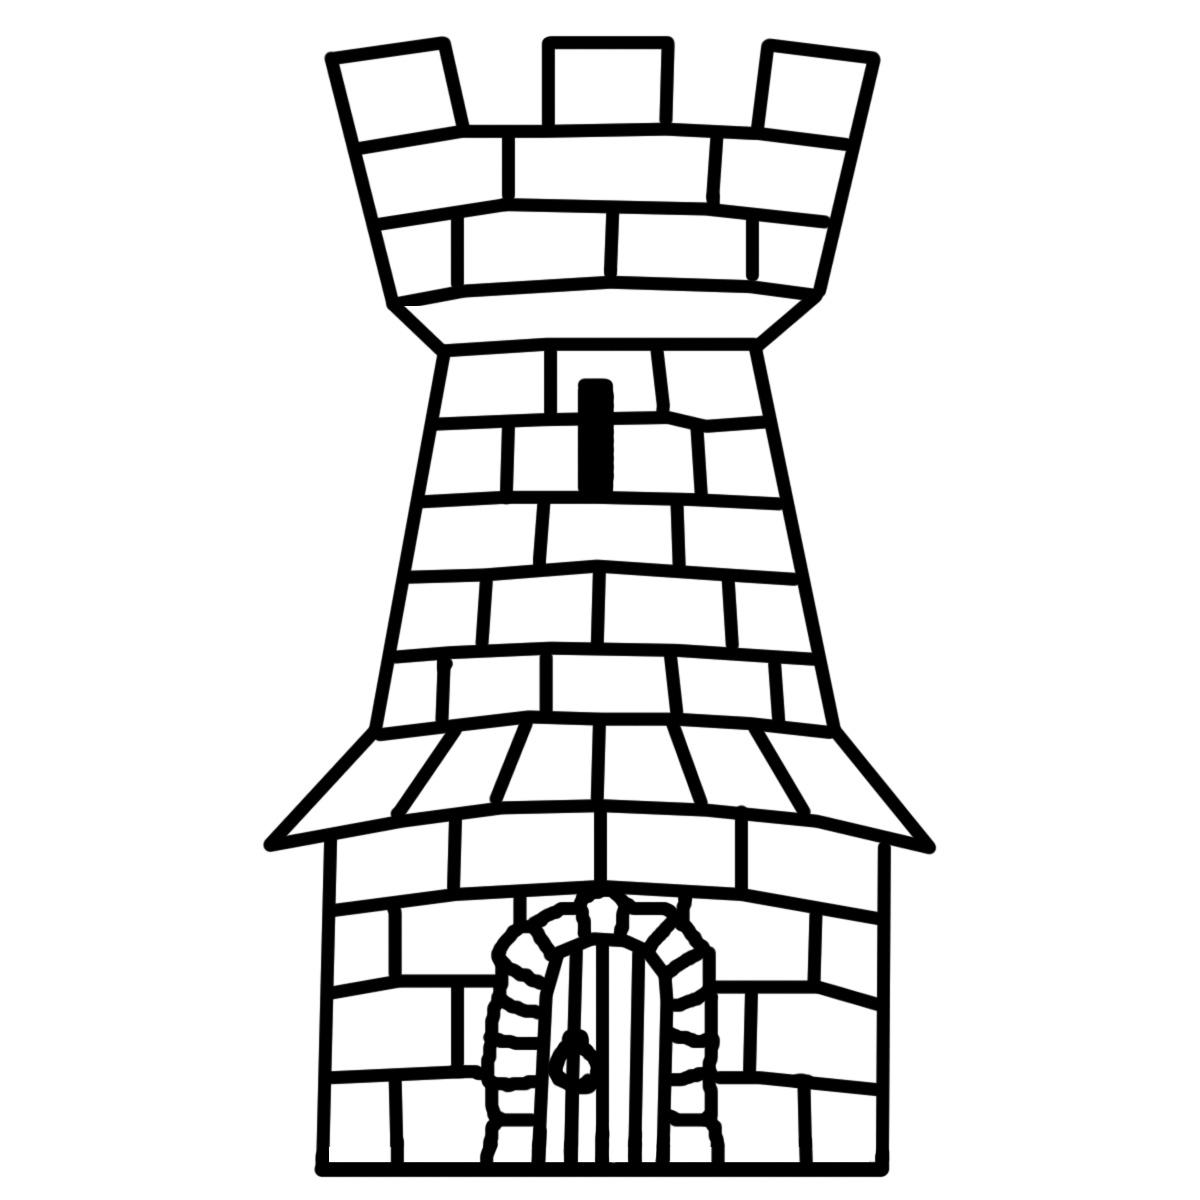 Heraldry Clip Art - ClipArt Best